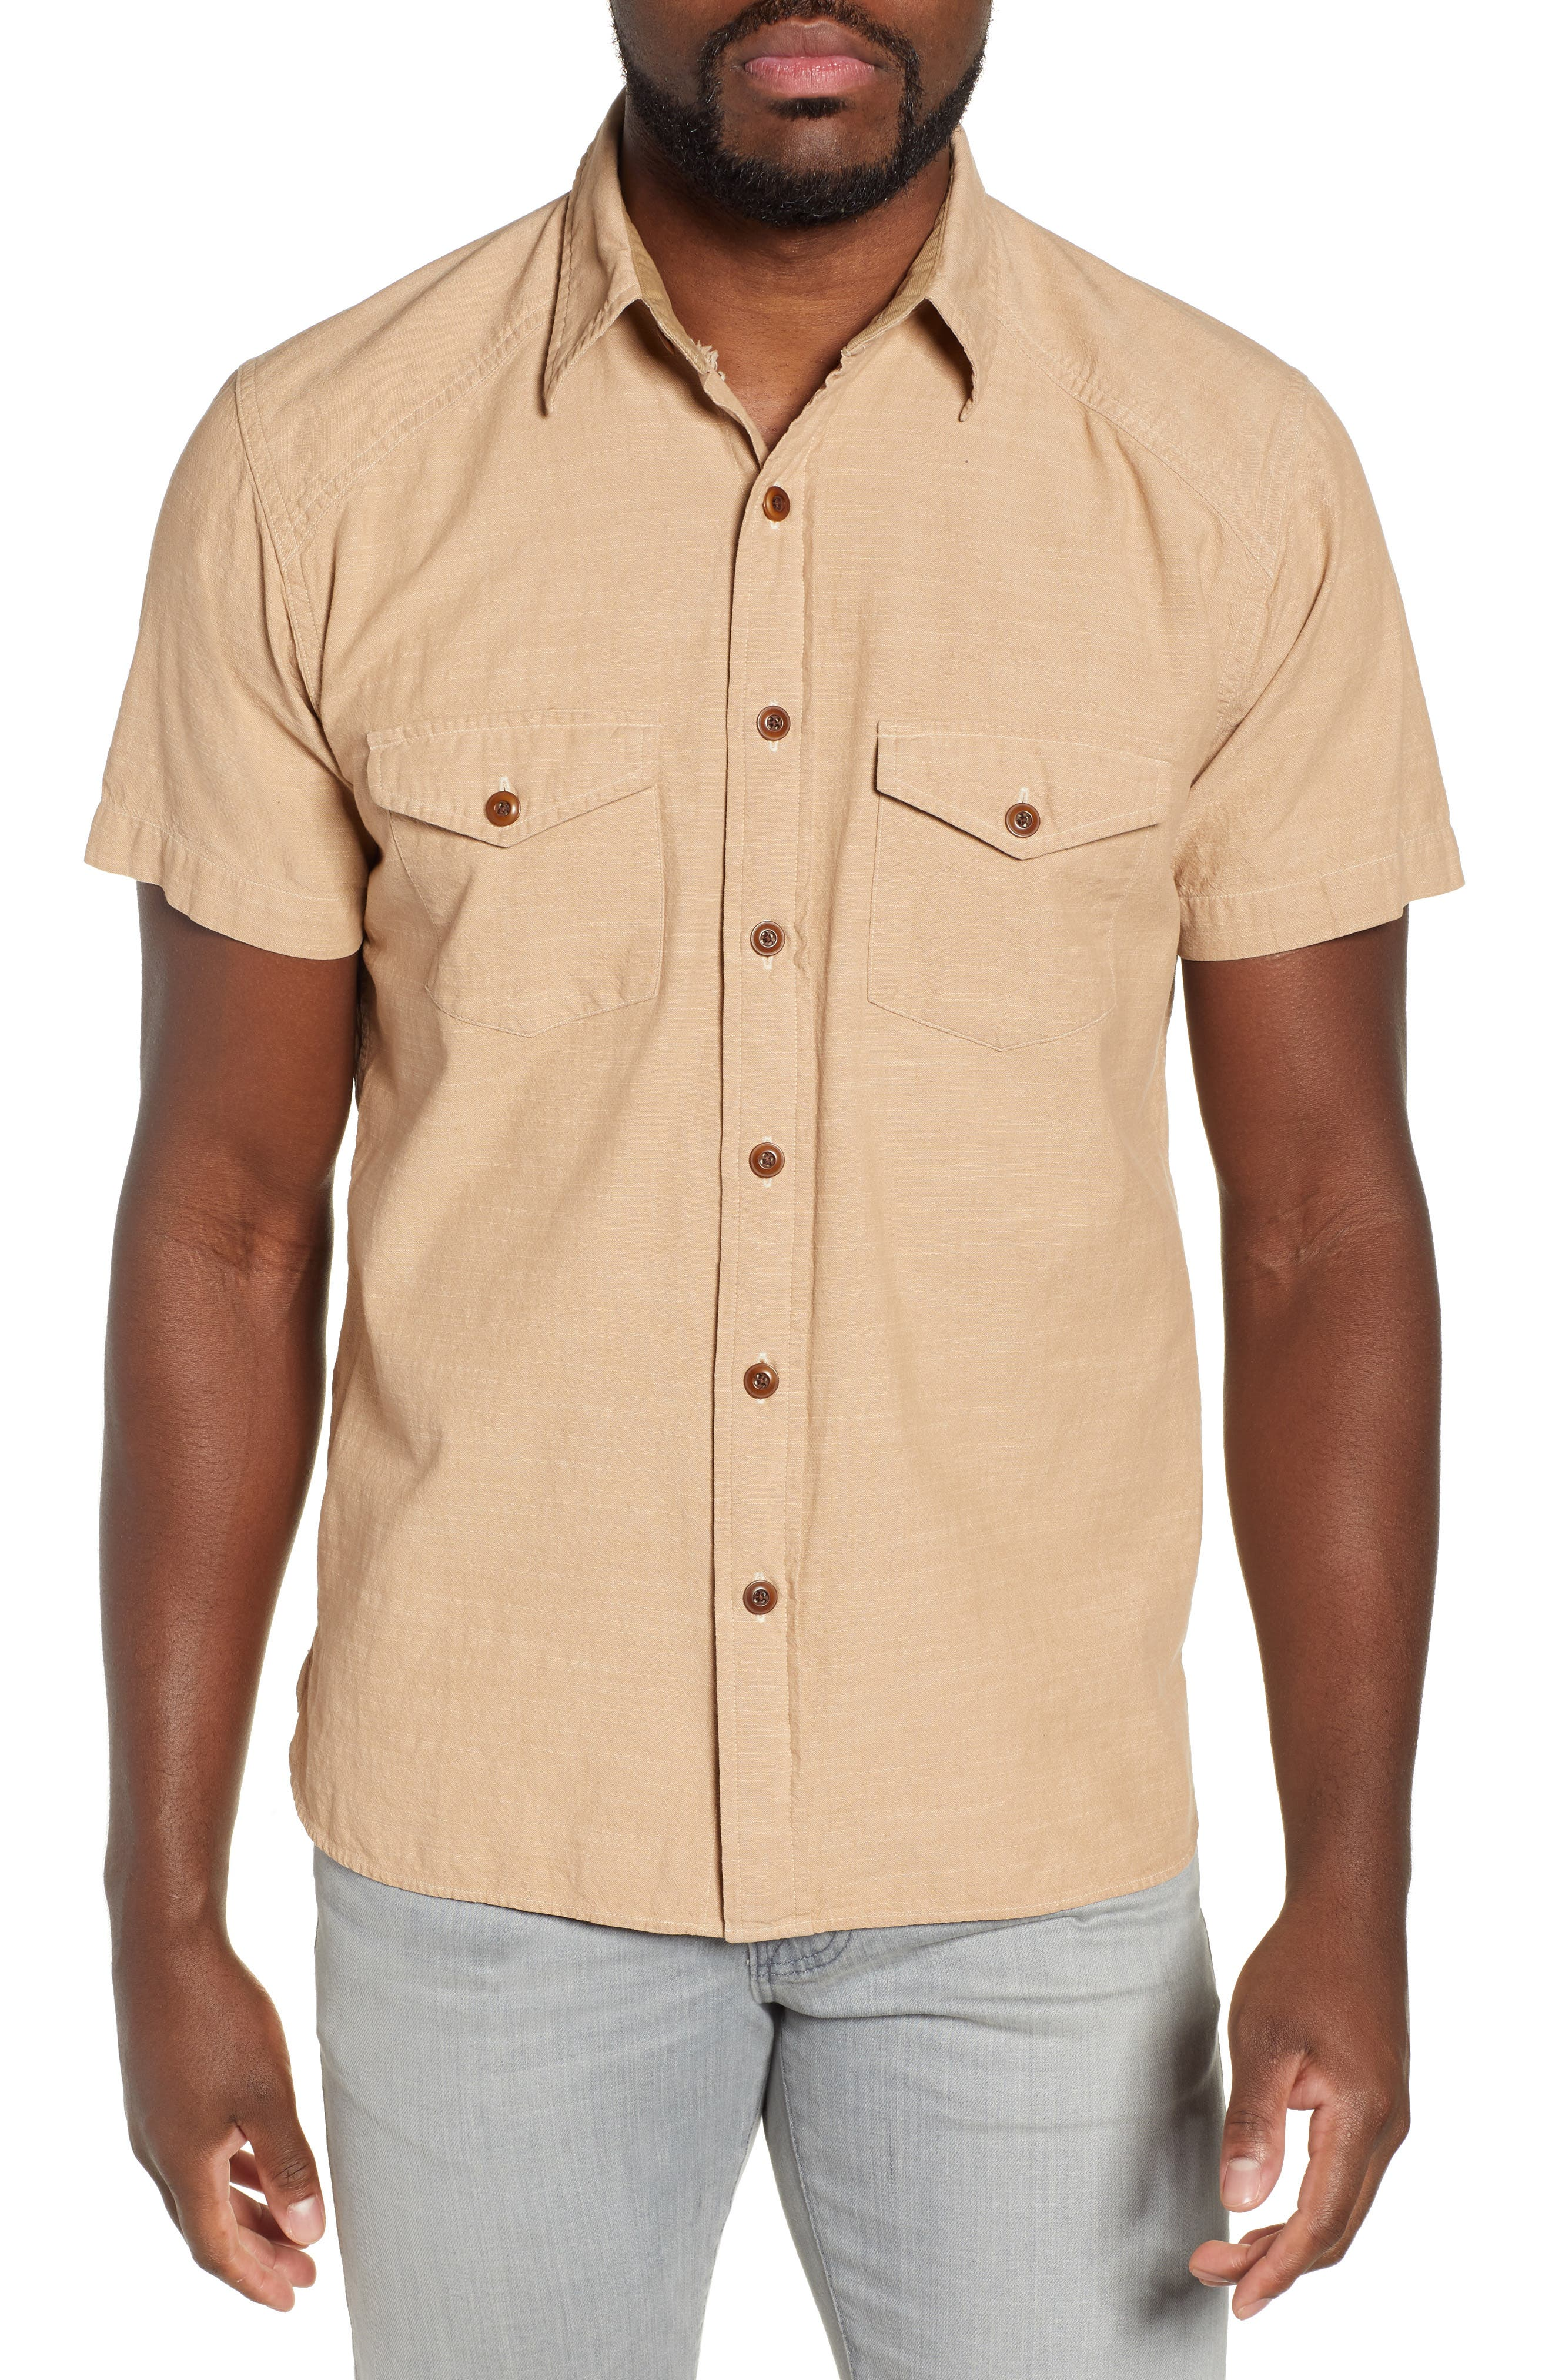 FRYE Addison Chambray Woven Shirt, Main, color, KRAFT BROWN